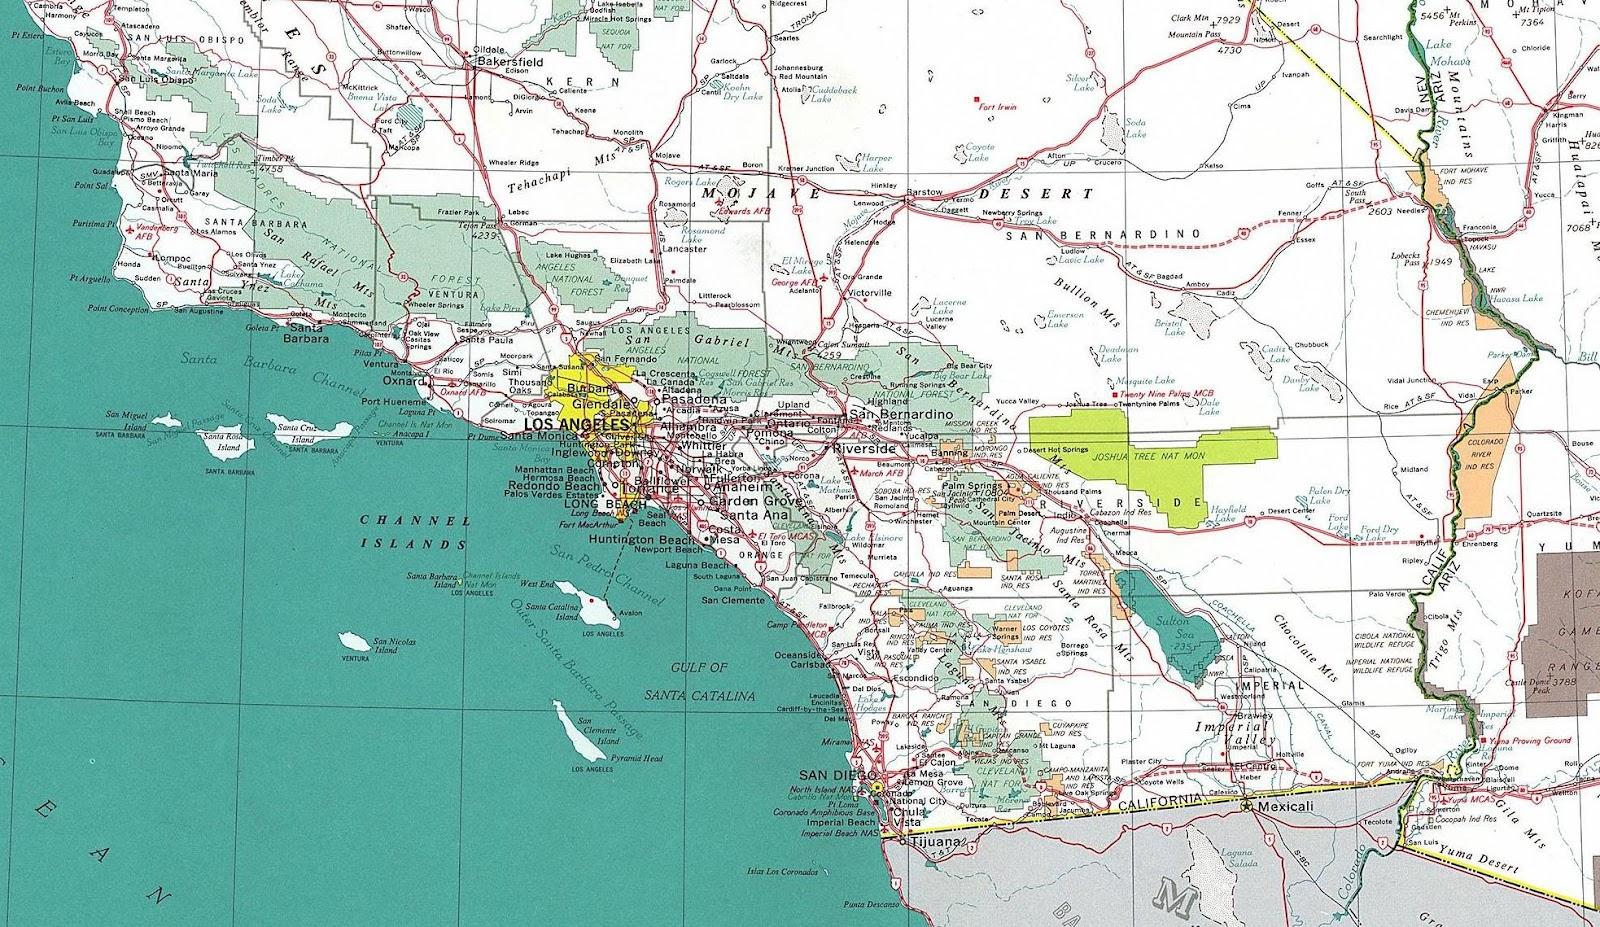 Southern California Road Map California River Map Driving Map Of - Printable Road Map Of Southern California